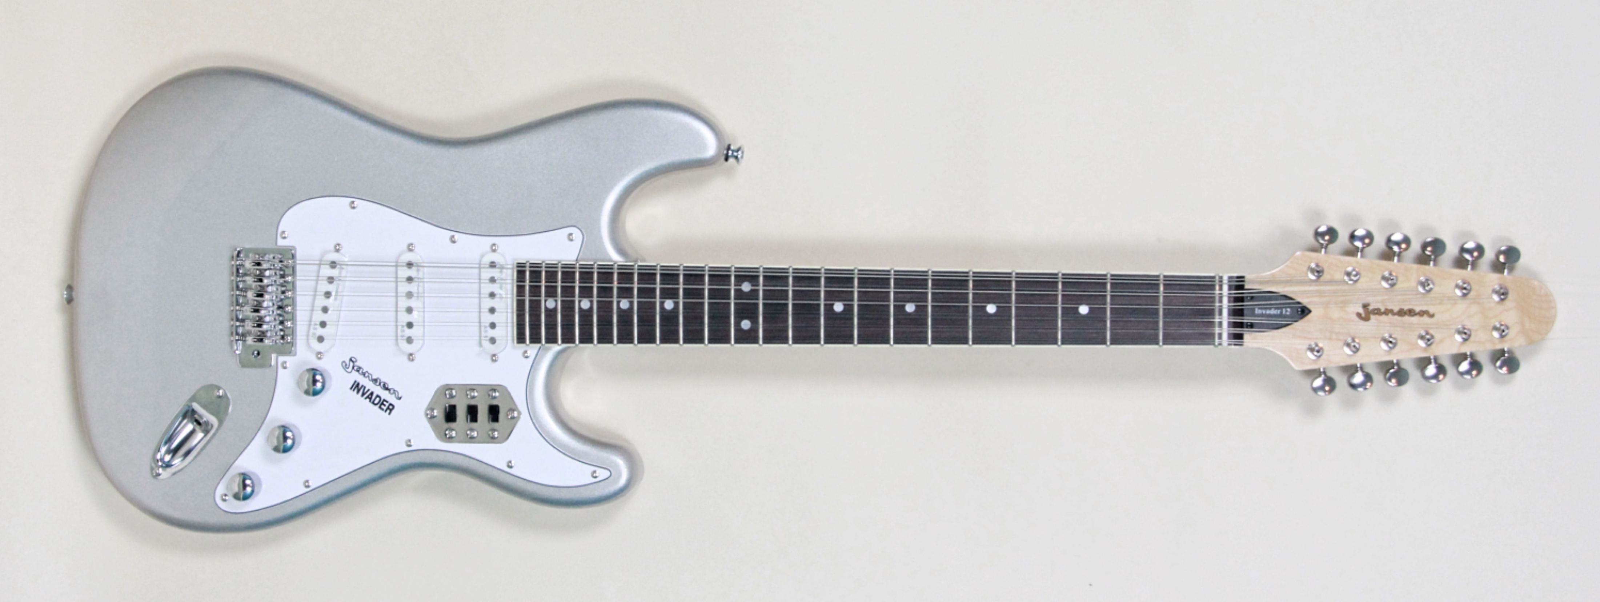 Jansen Invader 12 String Guitar Inca Silver Vintage Modern Guitars